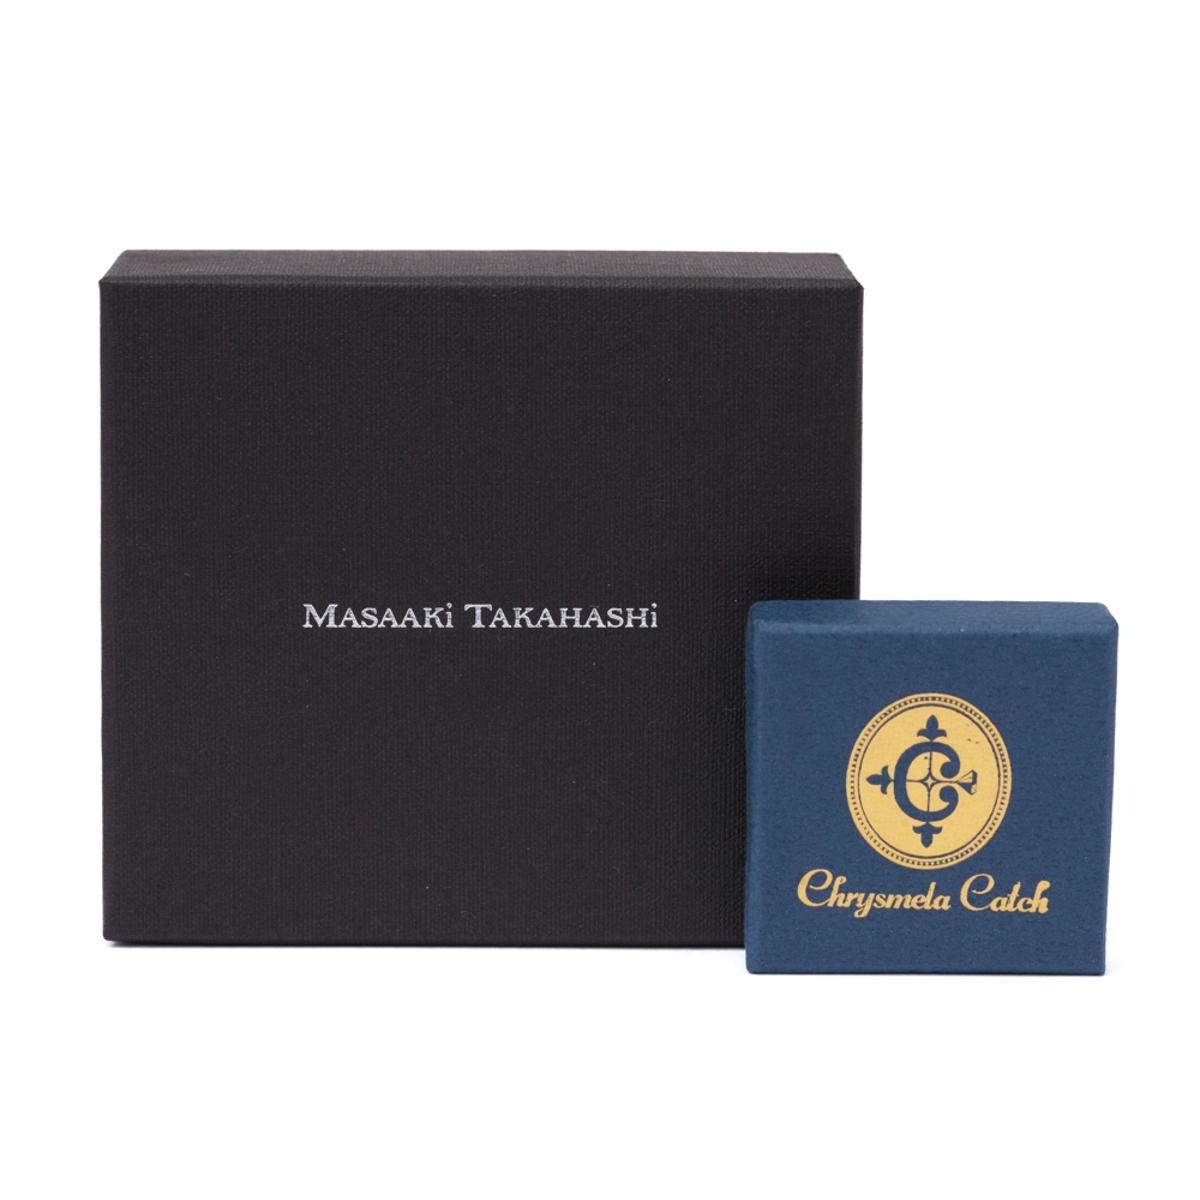 MASAAKi TAKAHASHi|elegance garden / elegance - バックピアス クリスメラキャチセット